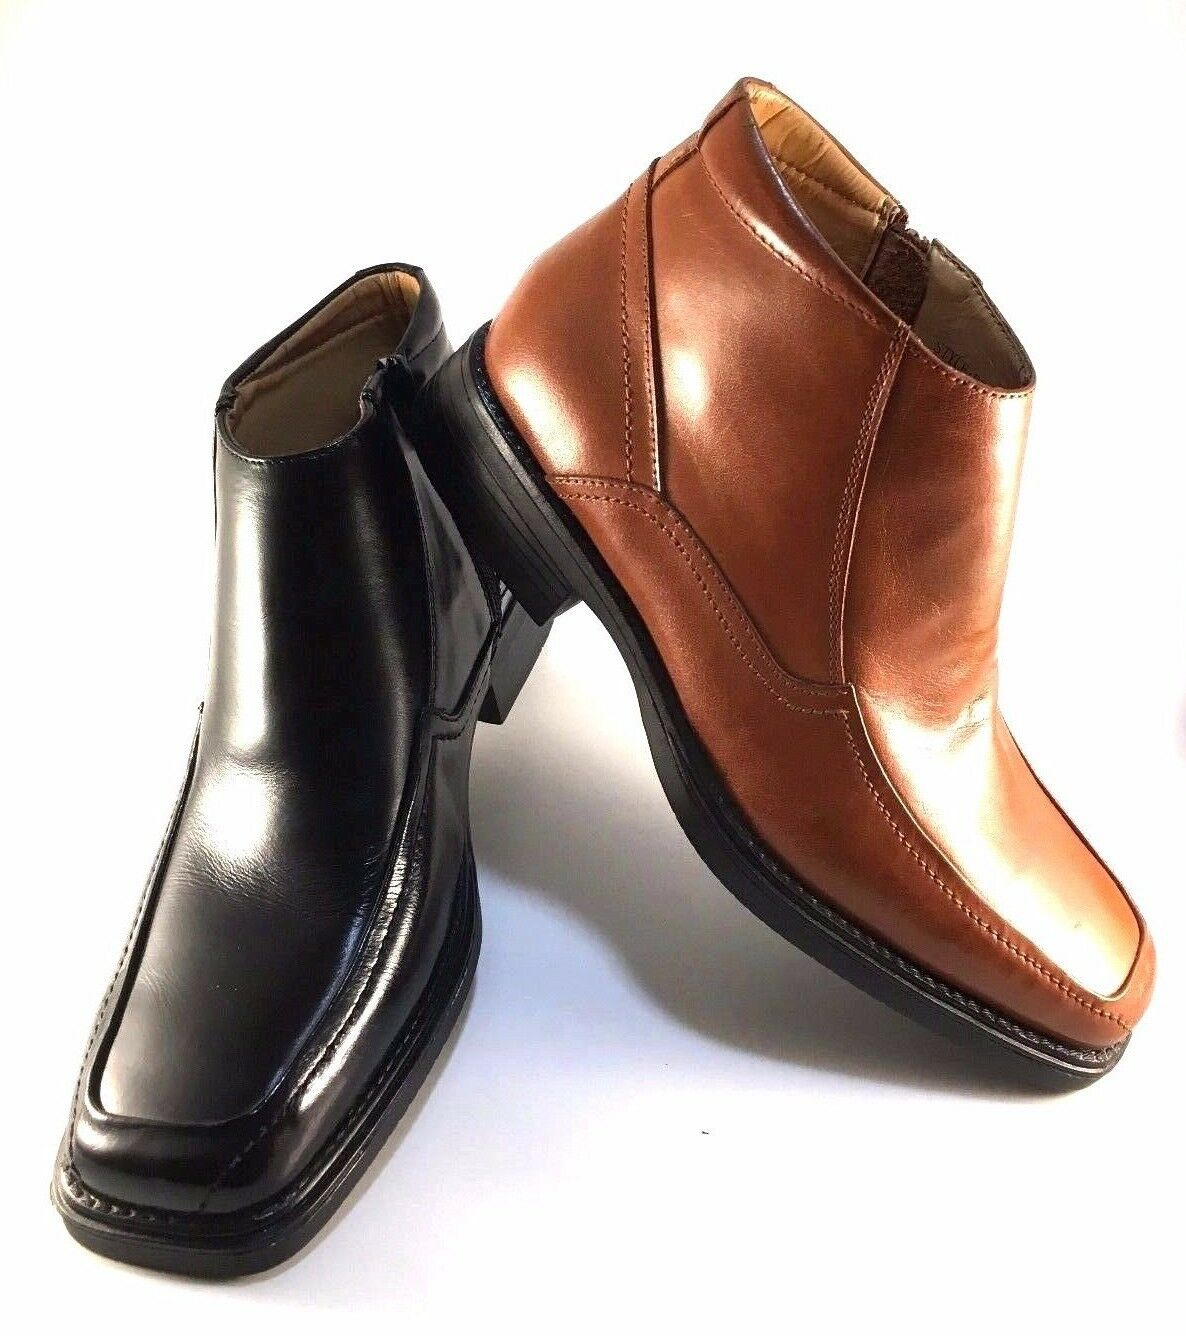 La Milano B5506 Tan Leather Men's Dressy Ankle Boots